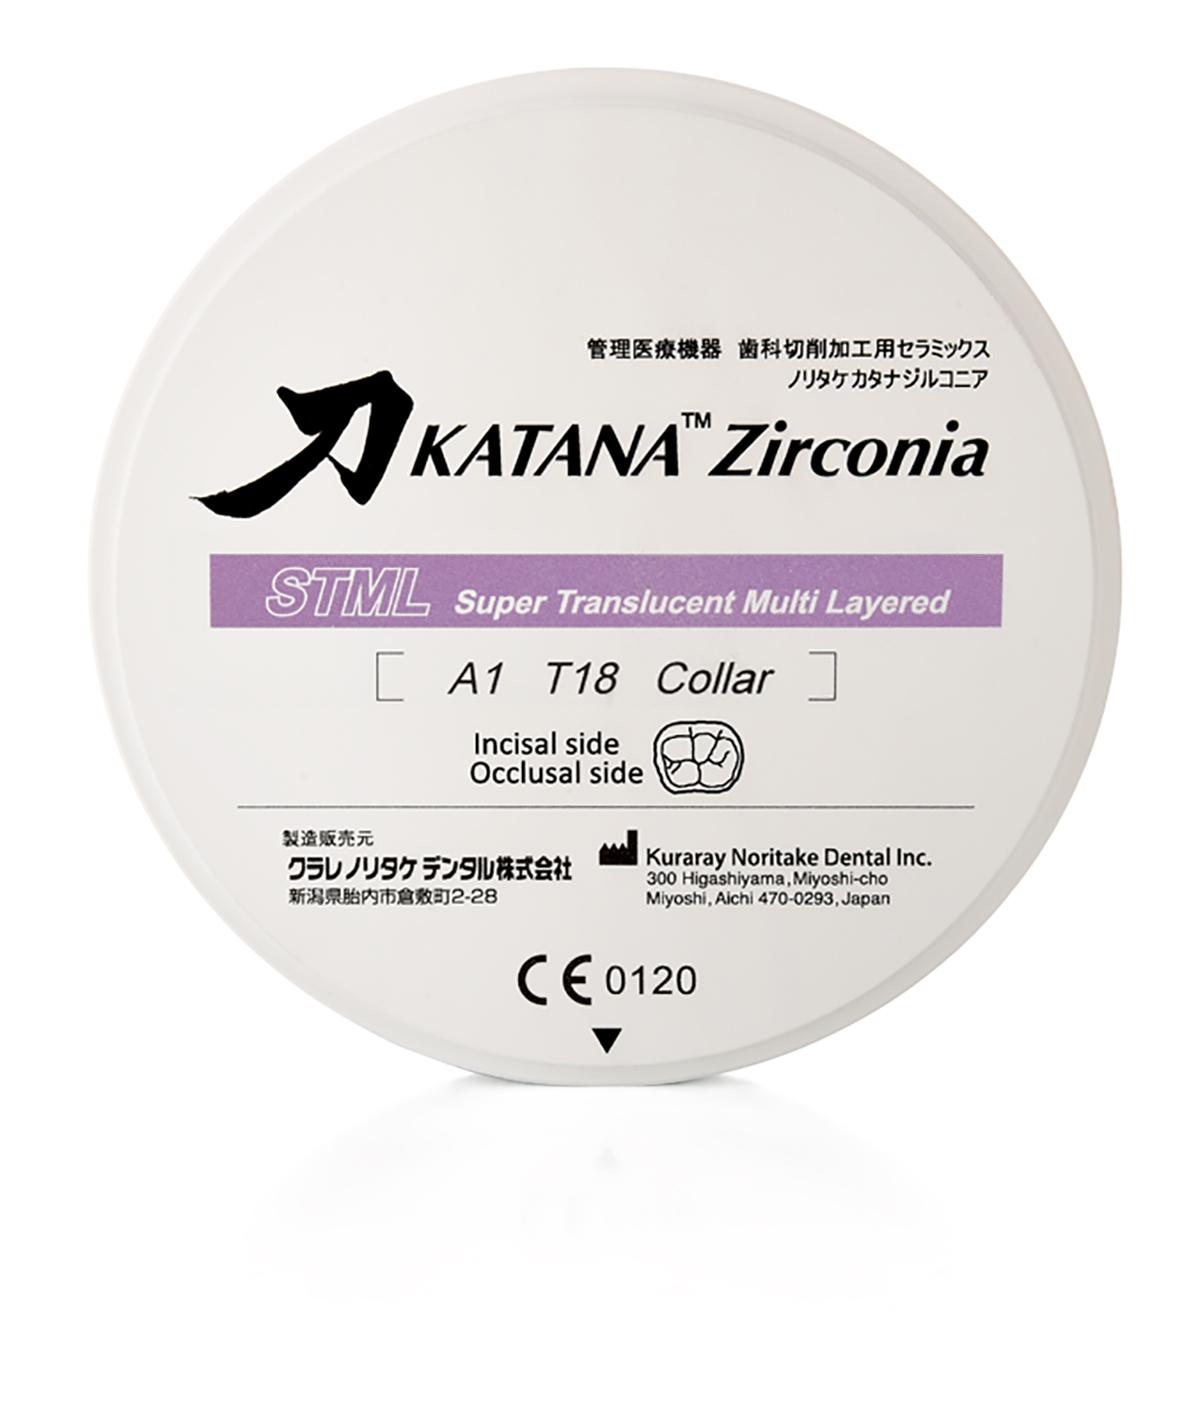 KATANA™ Zirconia STML